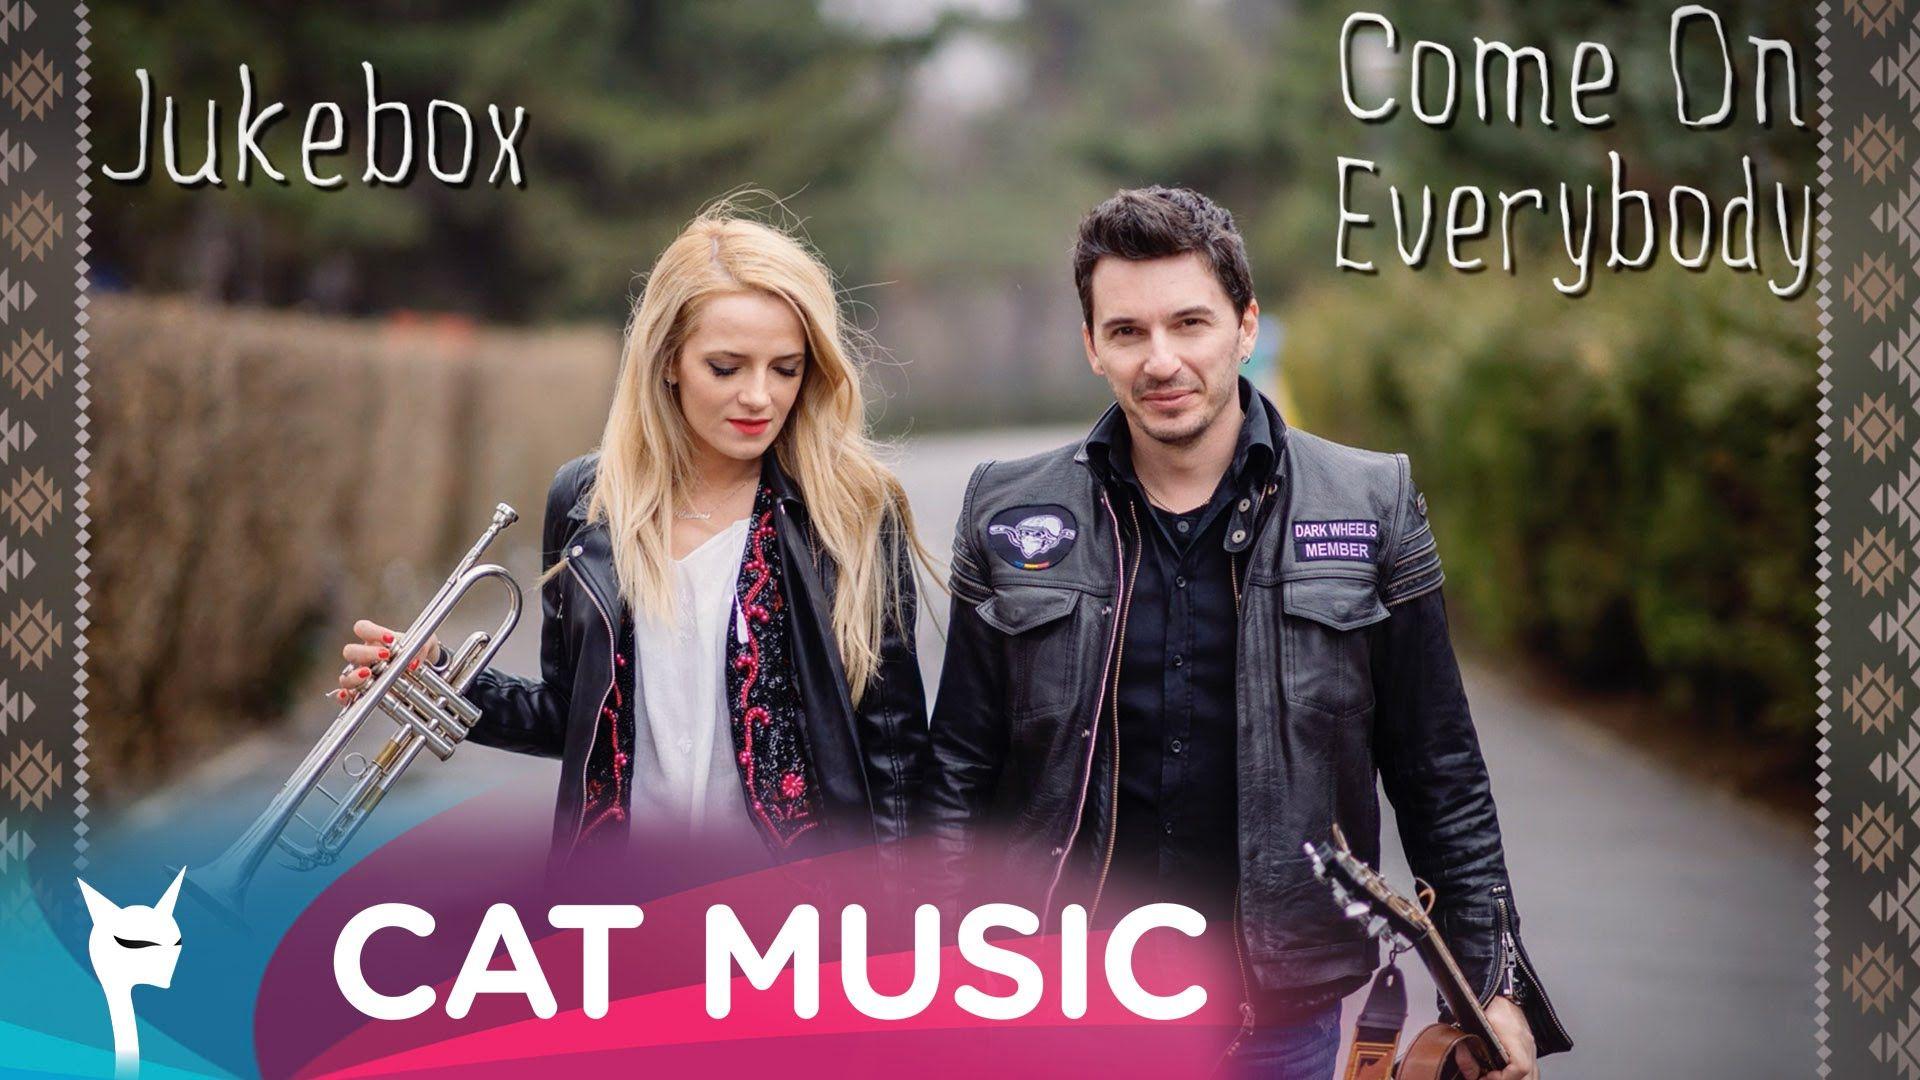 Jukebox Come On Everybody (Lyric Video) Lyrics